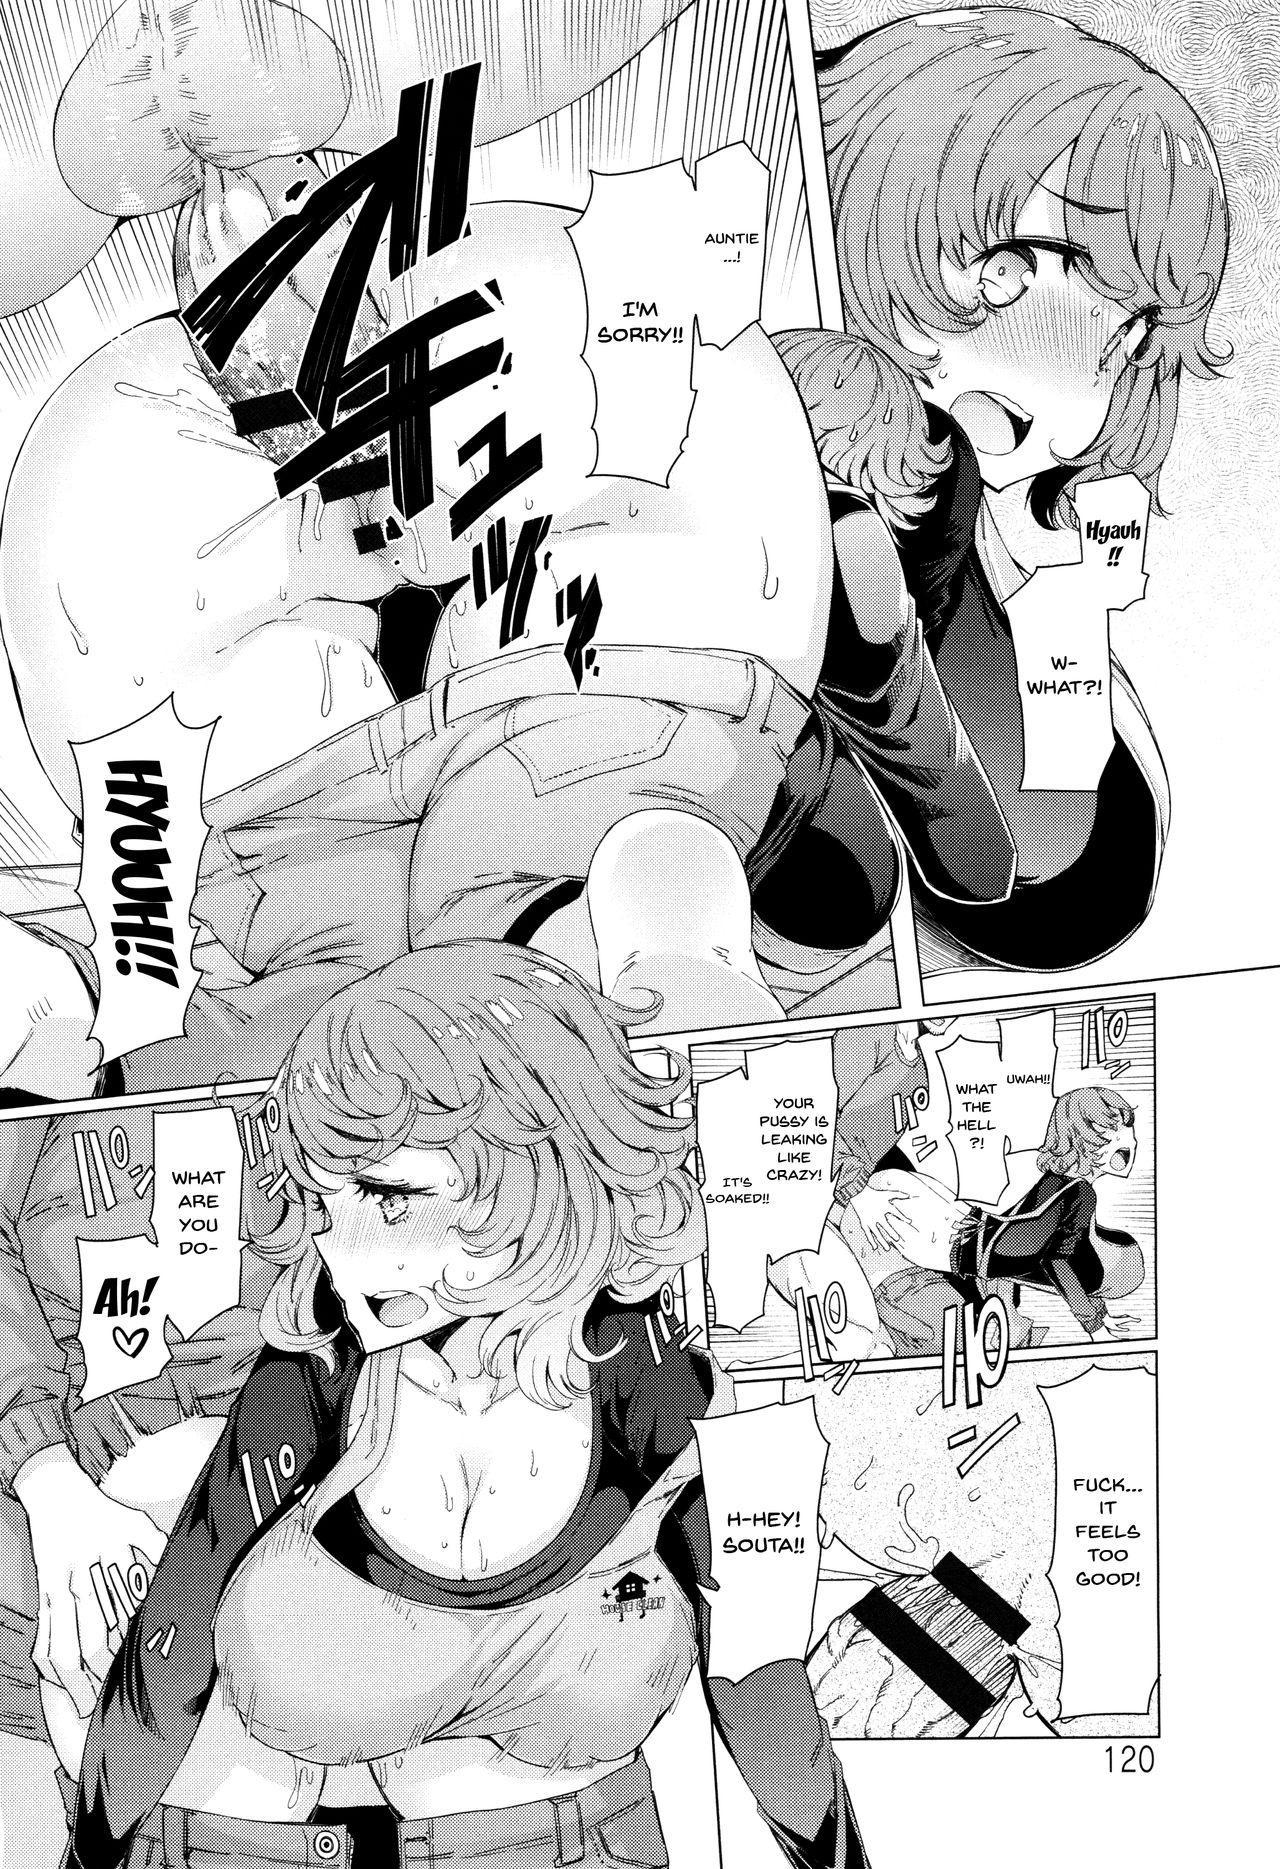 Hitozuma ga Ero Sugite Shigoto ni Naranai! | These Housewives Are Too Lewd I Can't Help It! 119